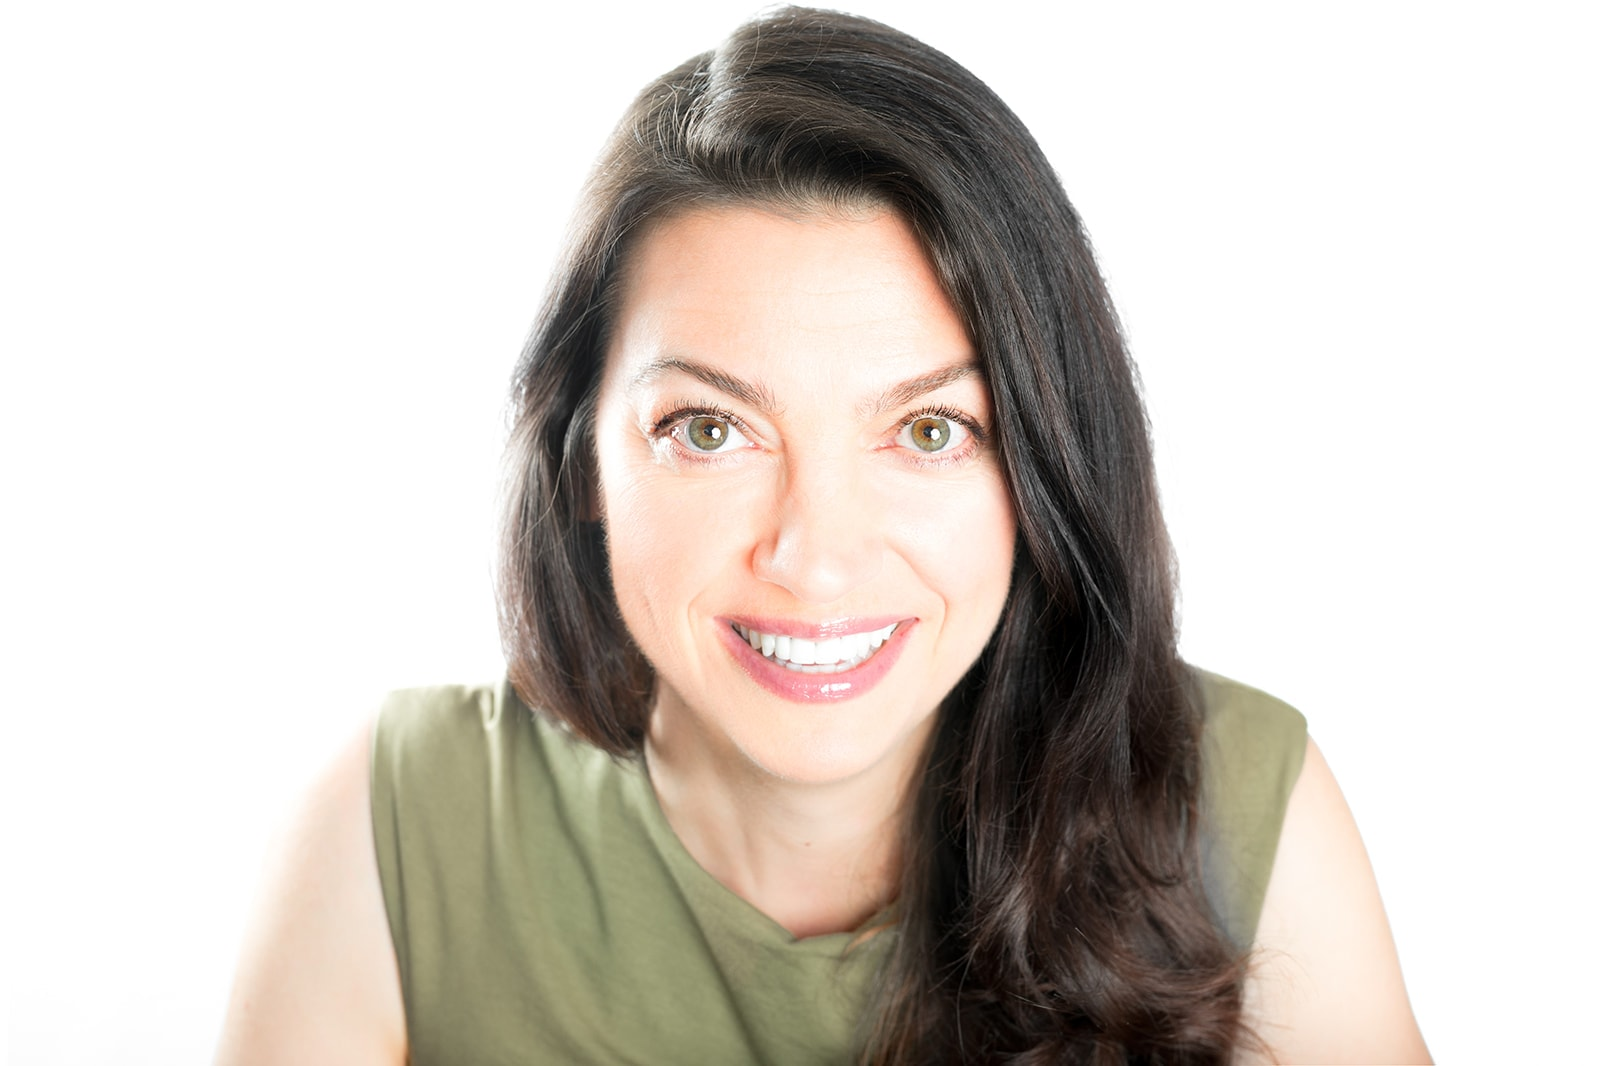 Crunchi non-toxic makeup review toxin-free makeup